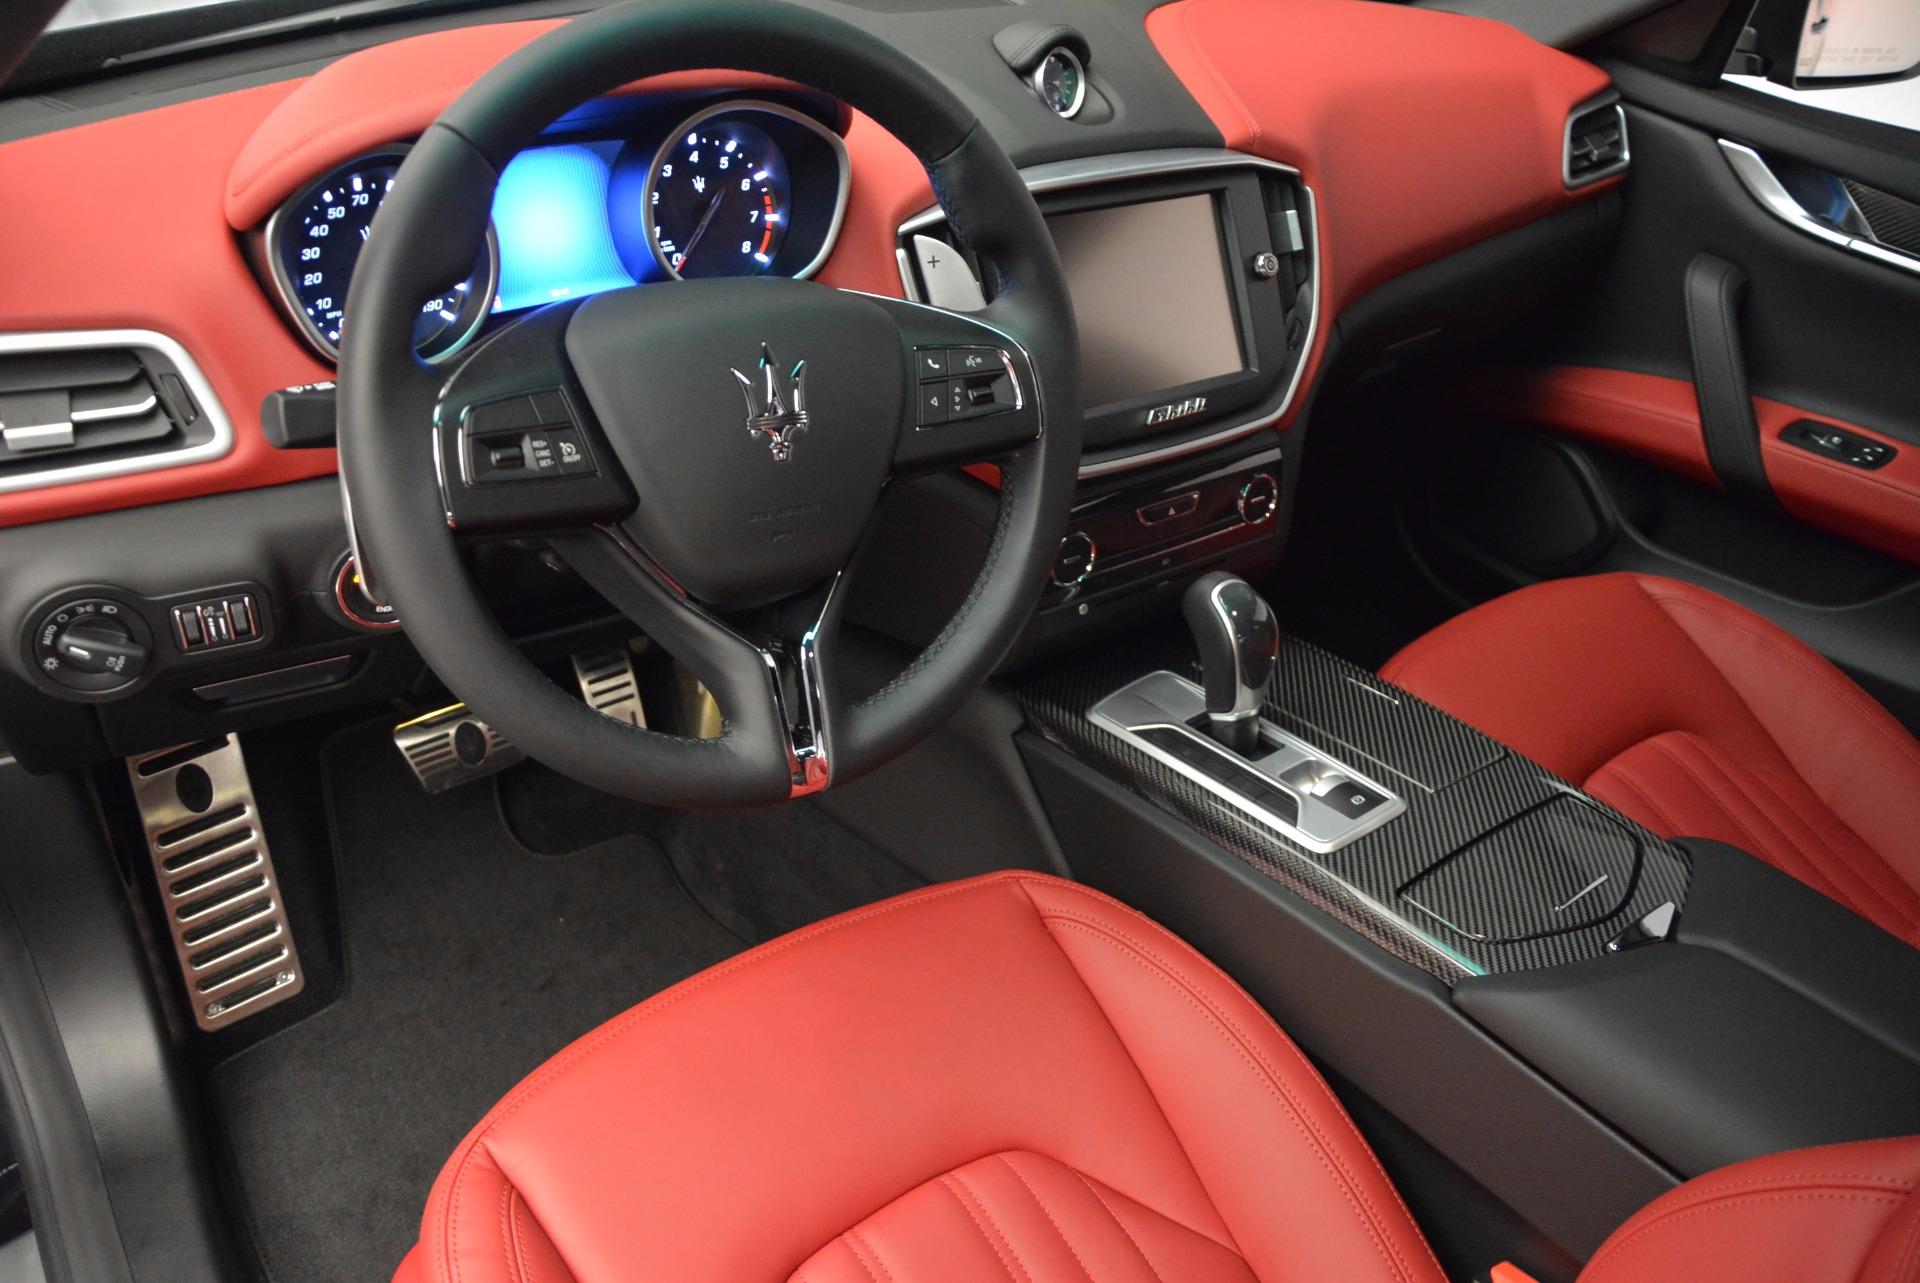 Used 2014 Maserati Ghibli S Q4 For Sale In Greenwich, CT 1459_p14